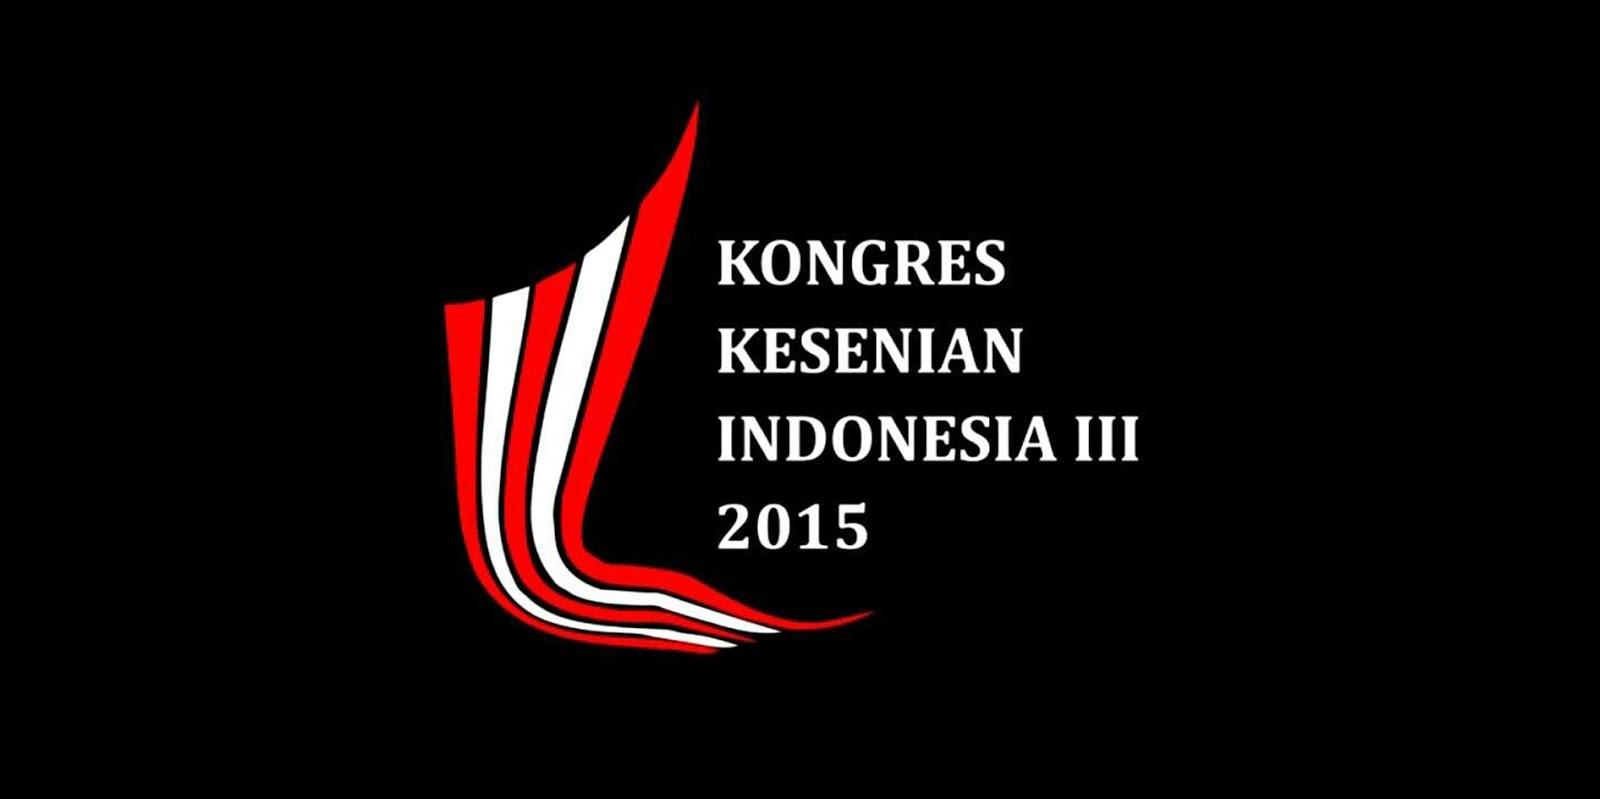 Kongres Kesenian Indonesia III di Bandung